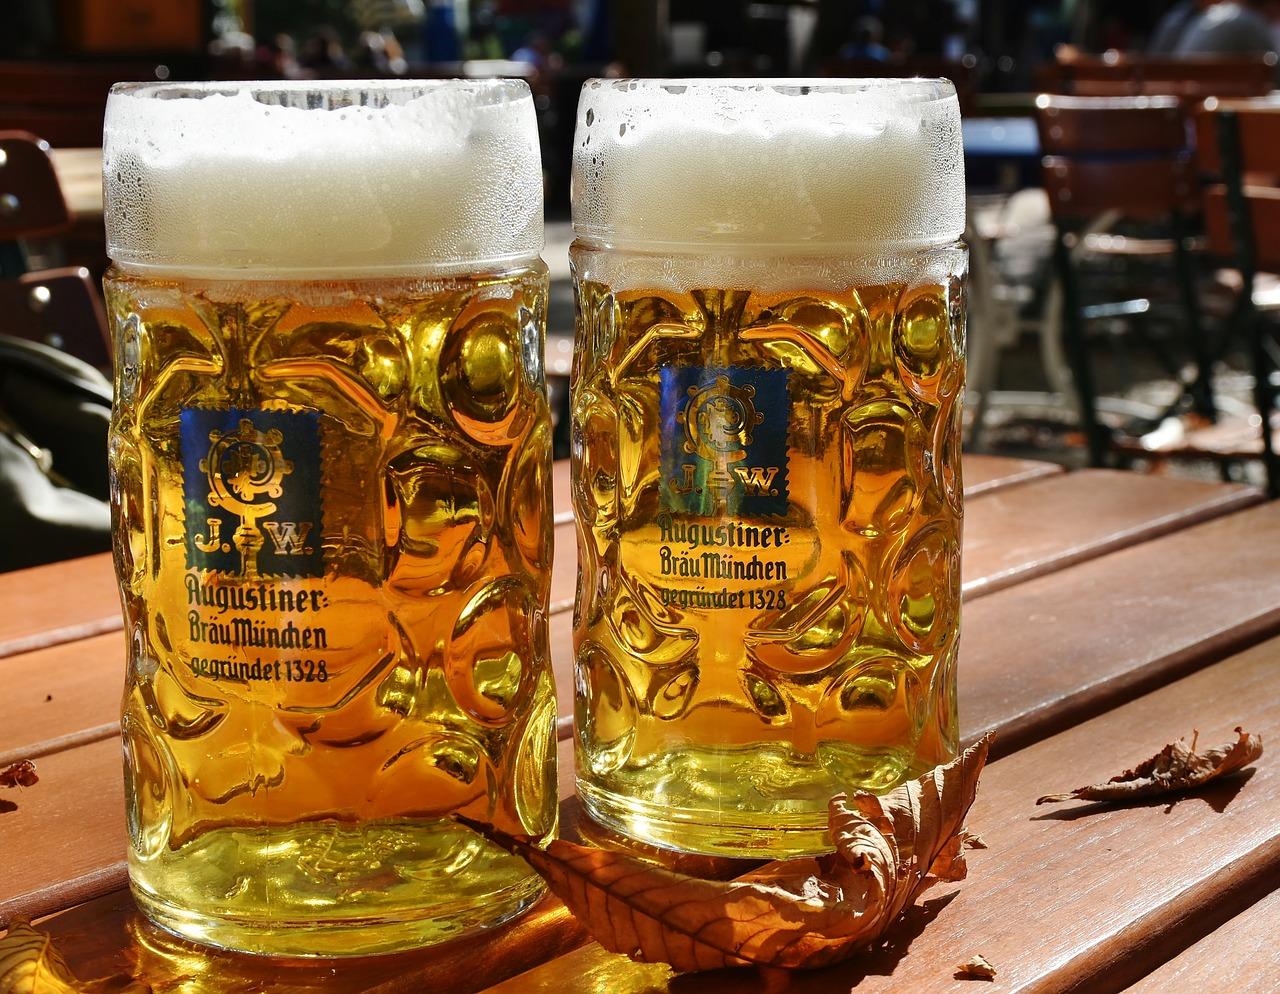 cerveza, medir cerveza, jarro de cerveza